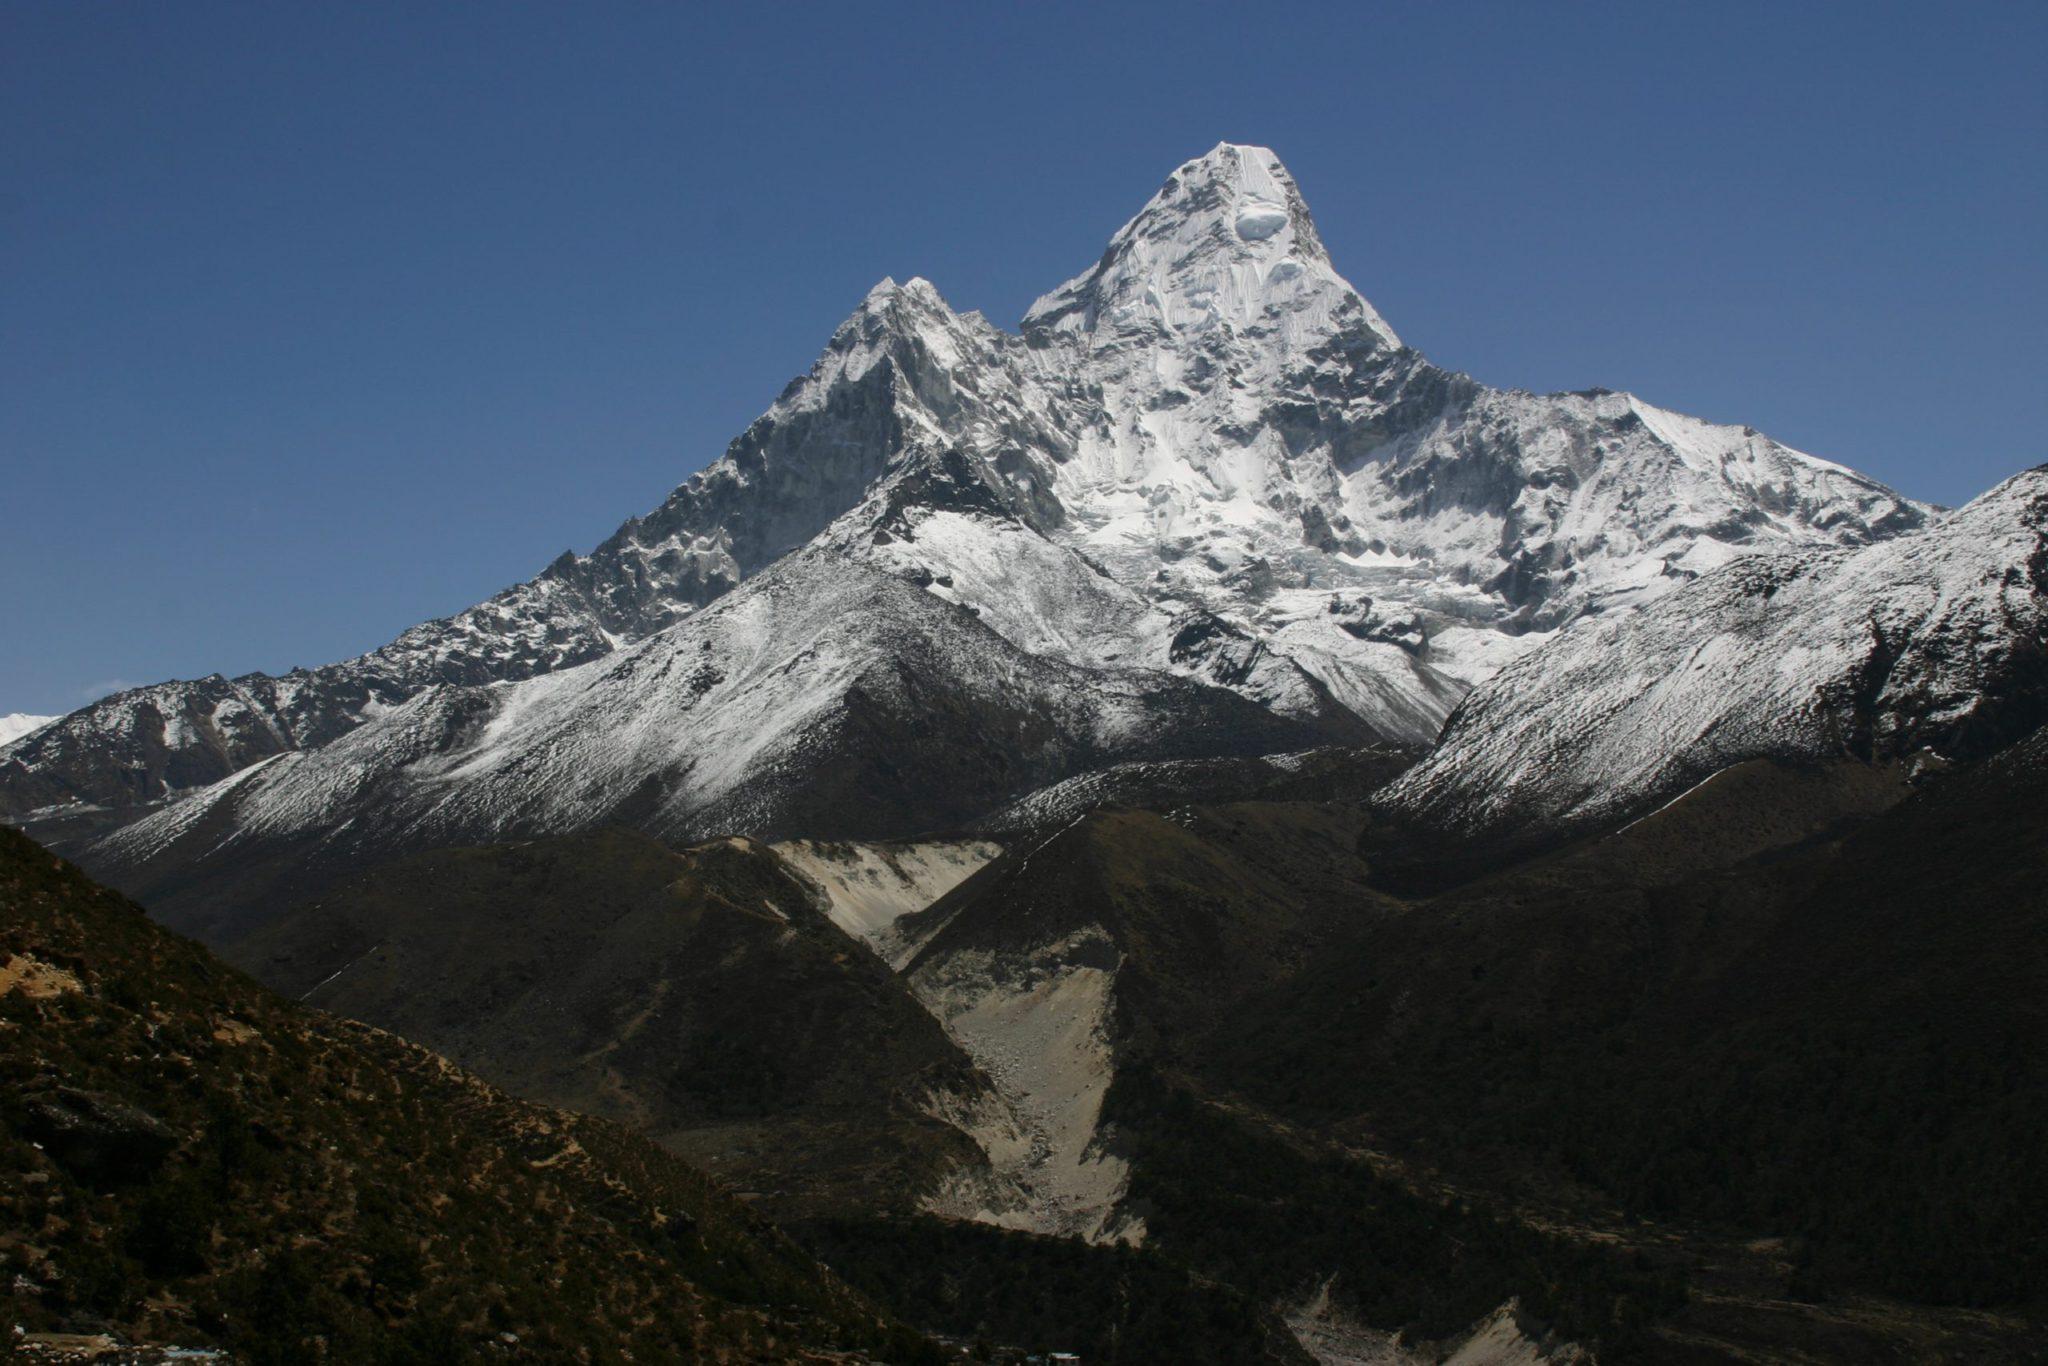 Luxury Everest Trek to Ama Dablam Base Camp Wellness Tour